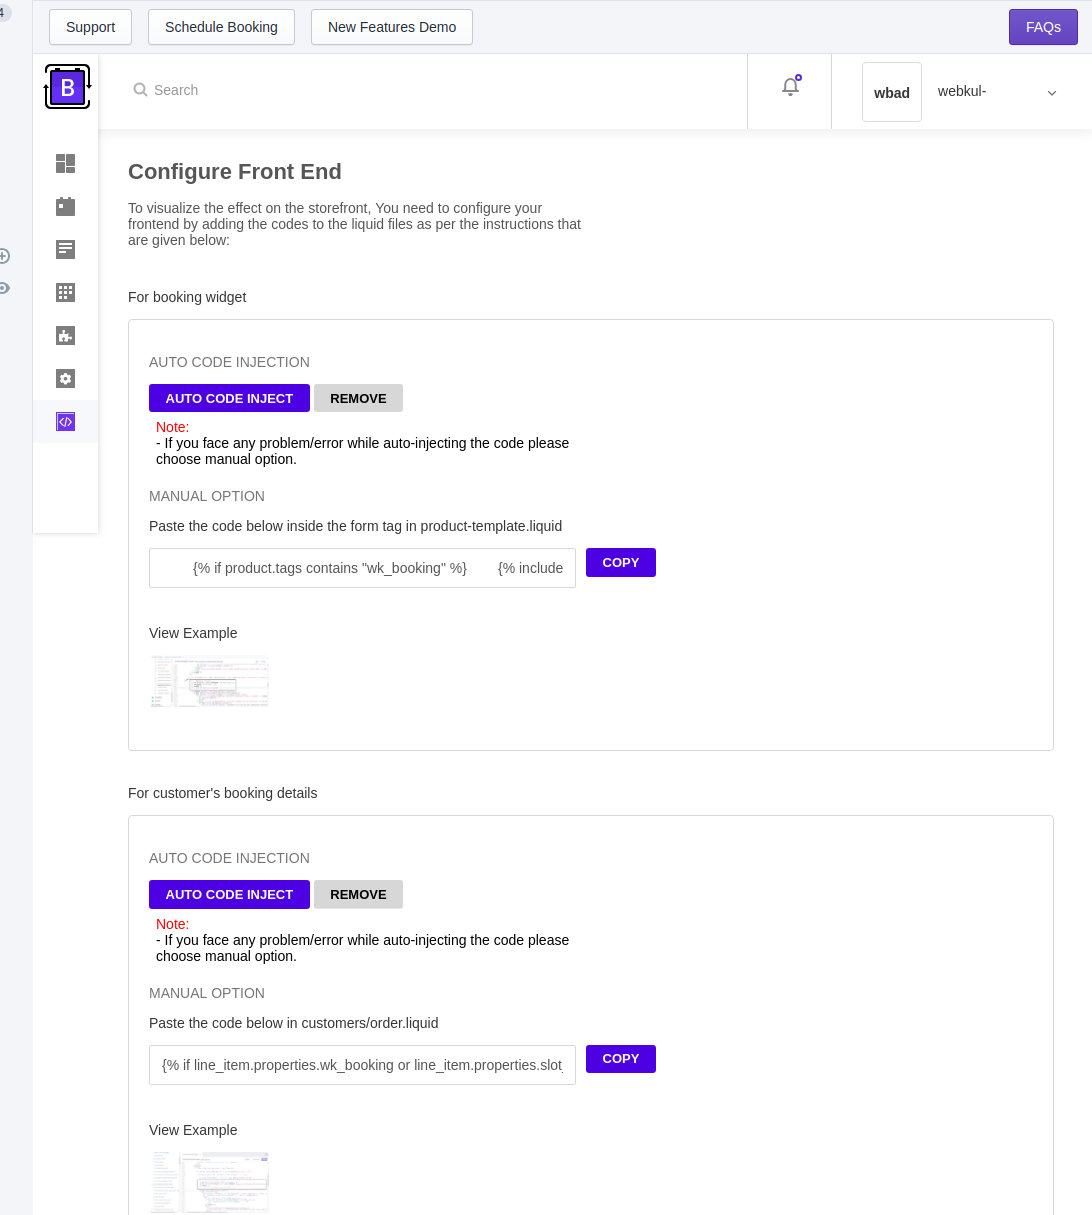 screencapture-webkul-booking-app-demo-myshopify-admin-apps-booking-app-by-webkul-booking-management-web-en-app-2019-04-26-19_45_44